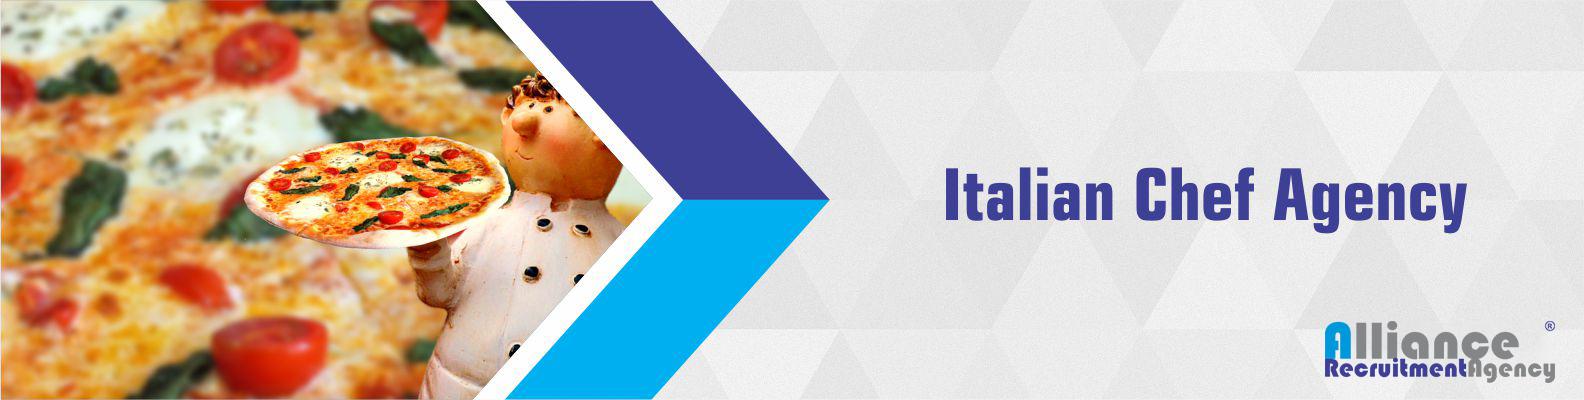 Italian Chef Agency